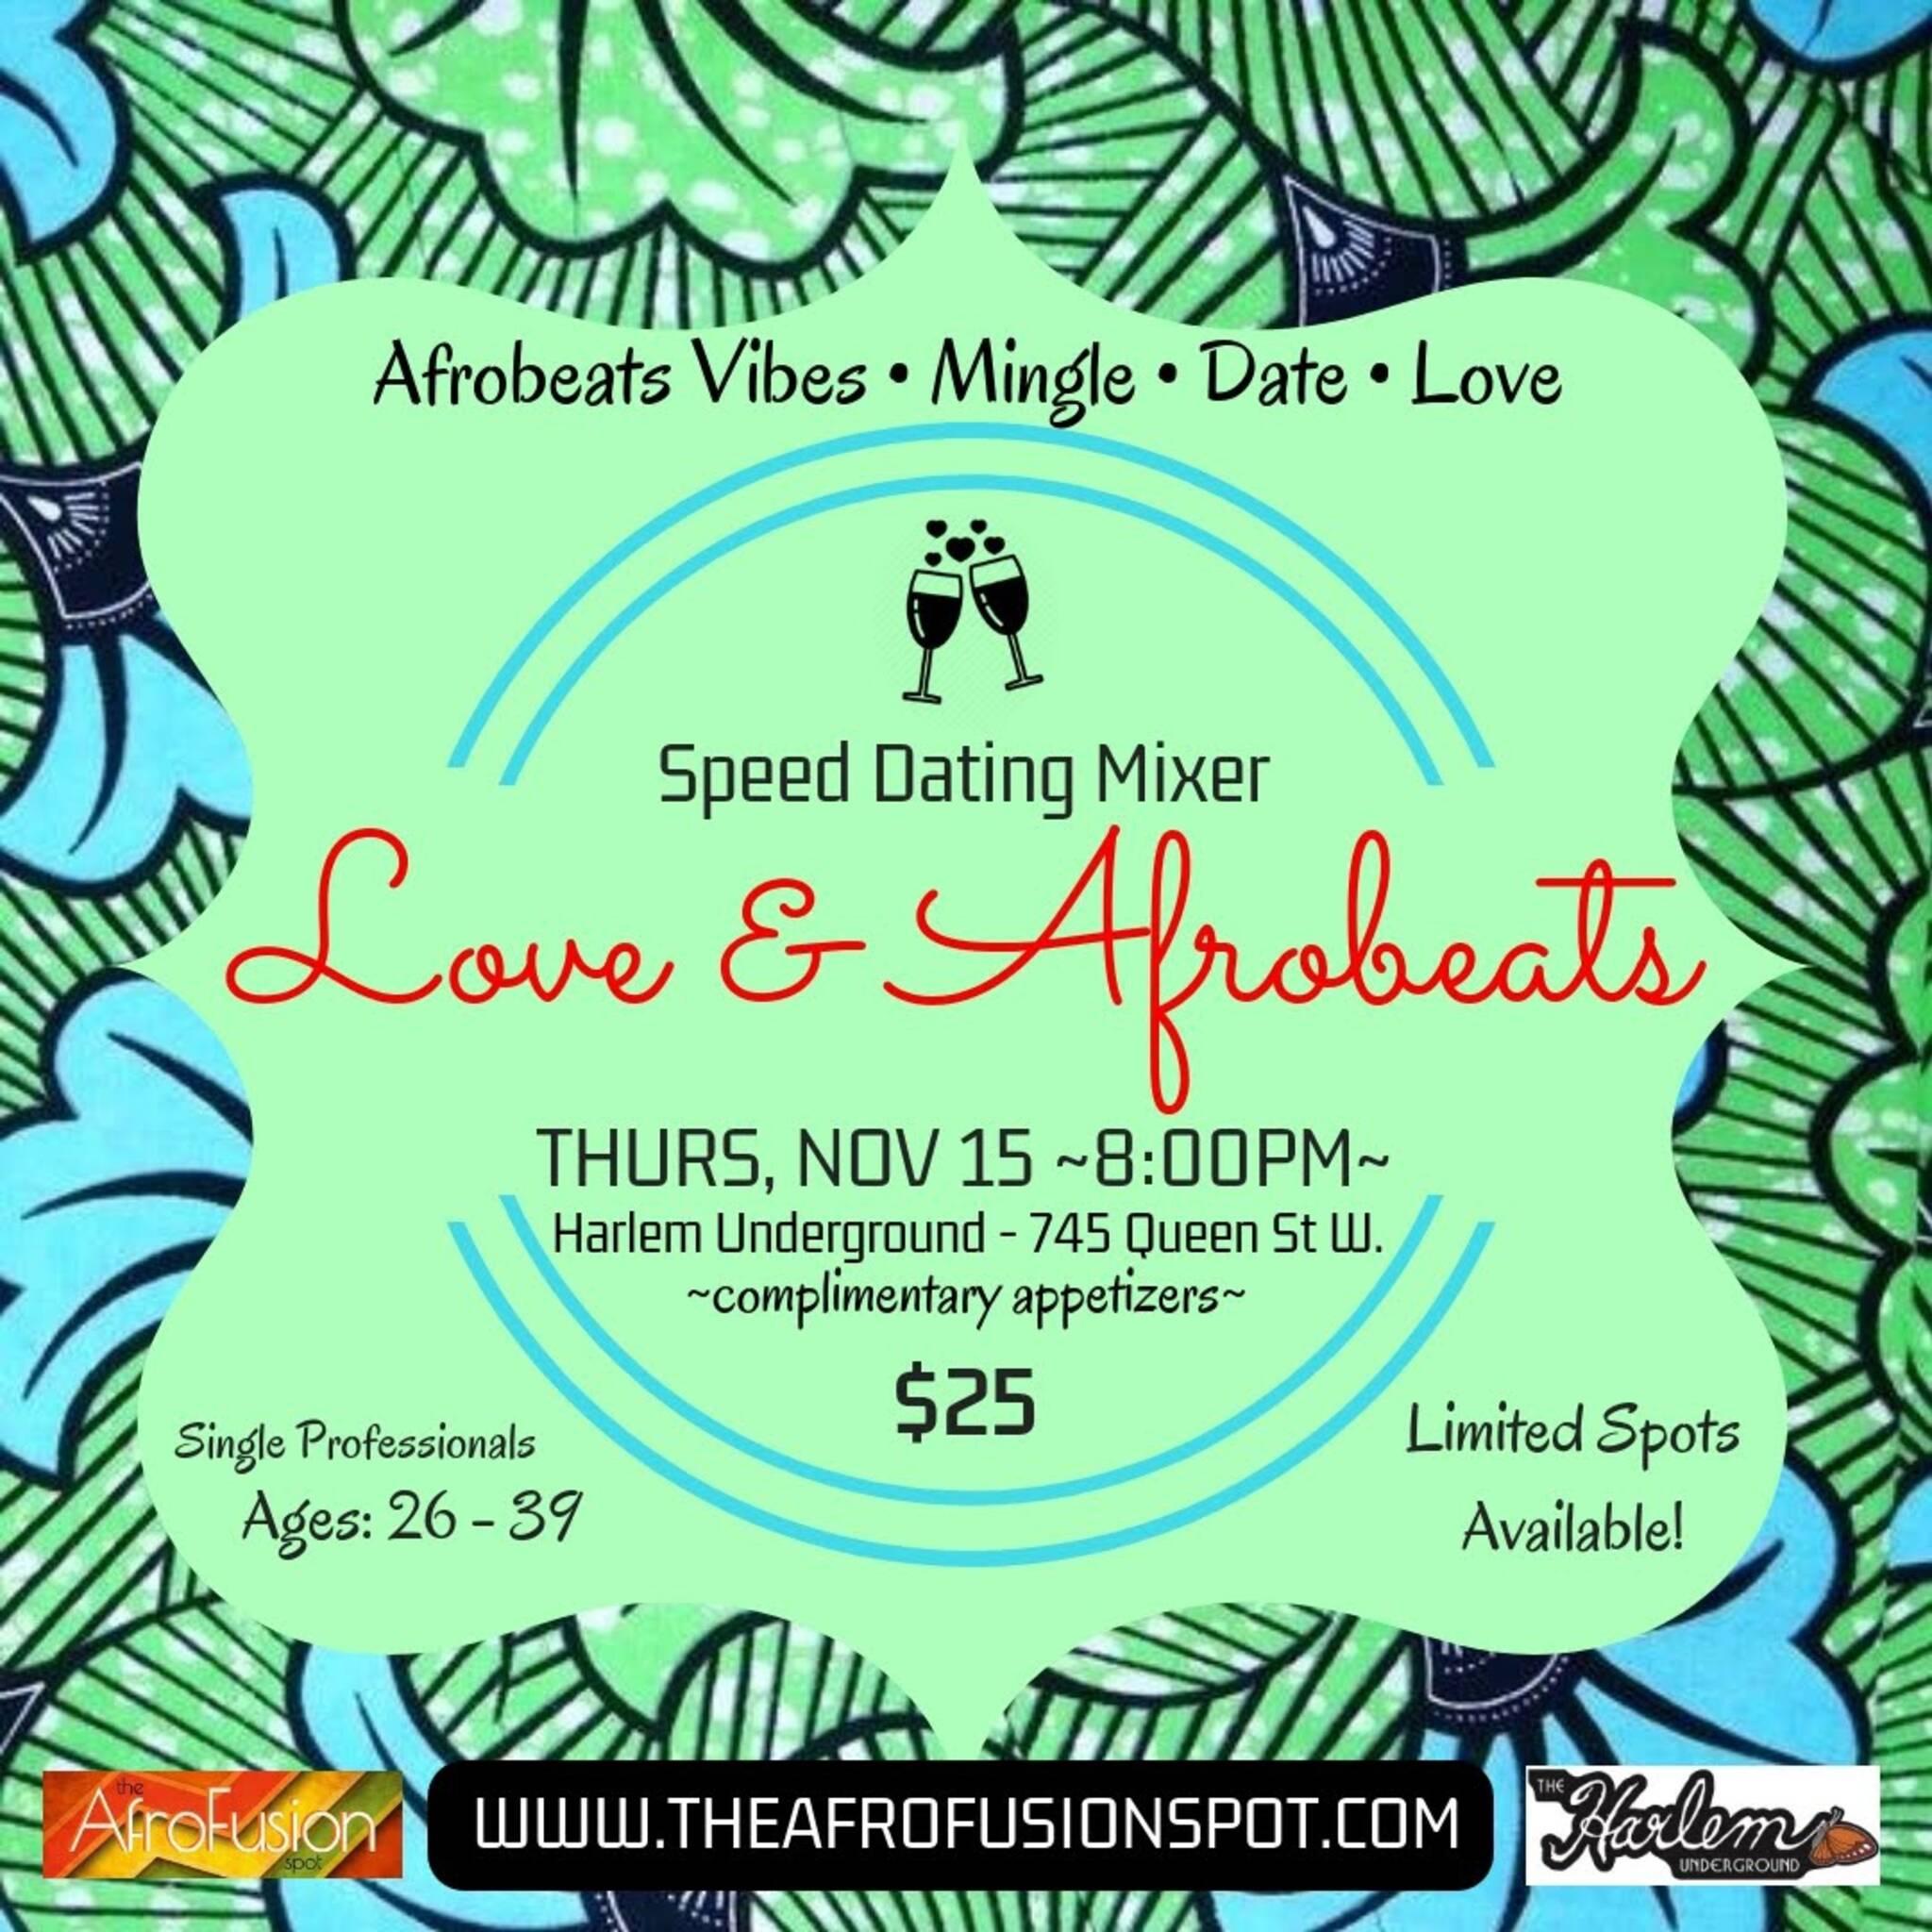 LOVE & AFROBEATS: Speed Dating Mixer